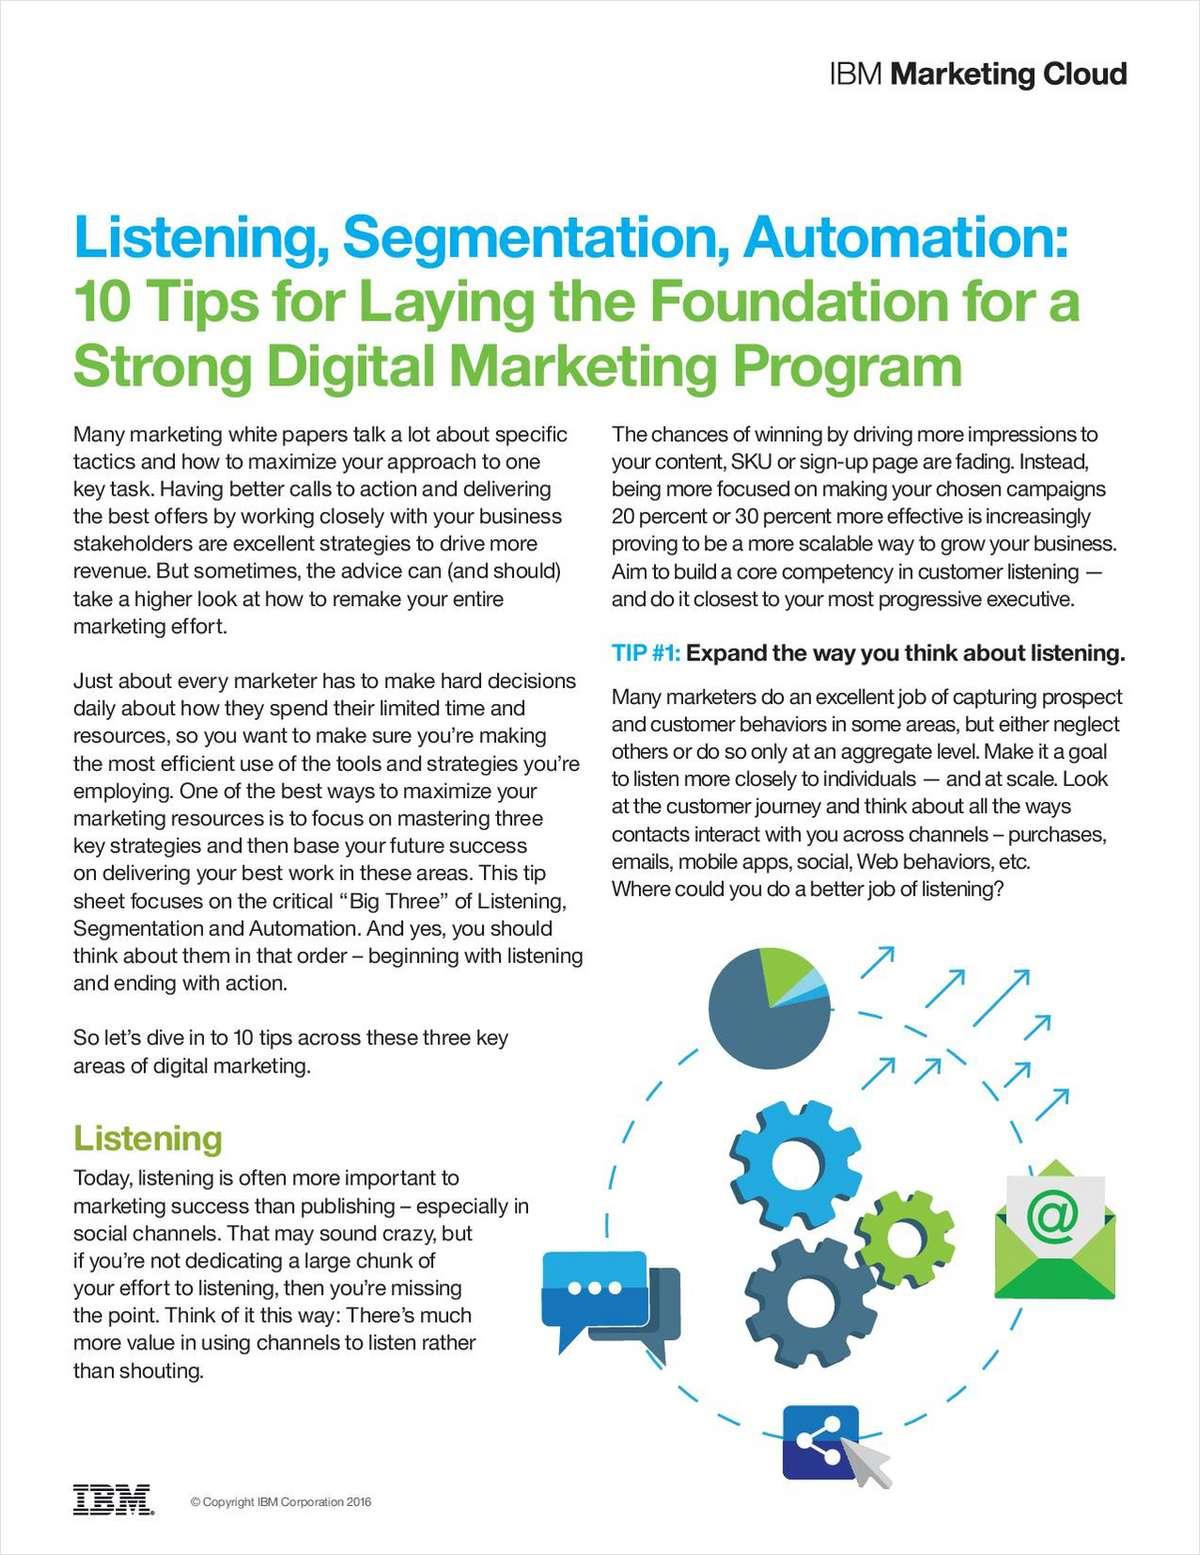 Listening, Segmentation, Automation: 10 Tips for a Stronger Digital Marketing Program